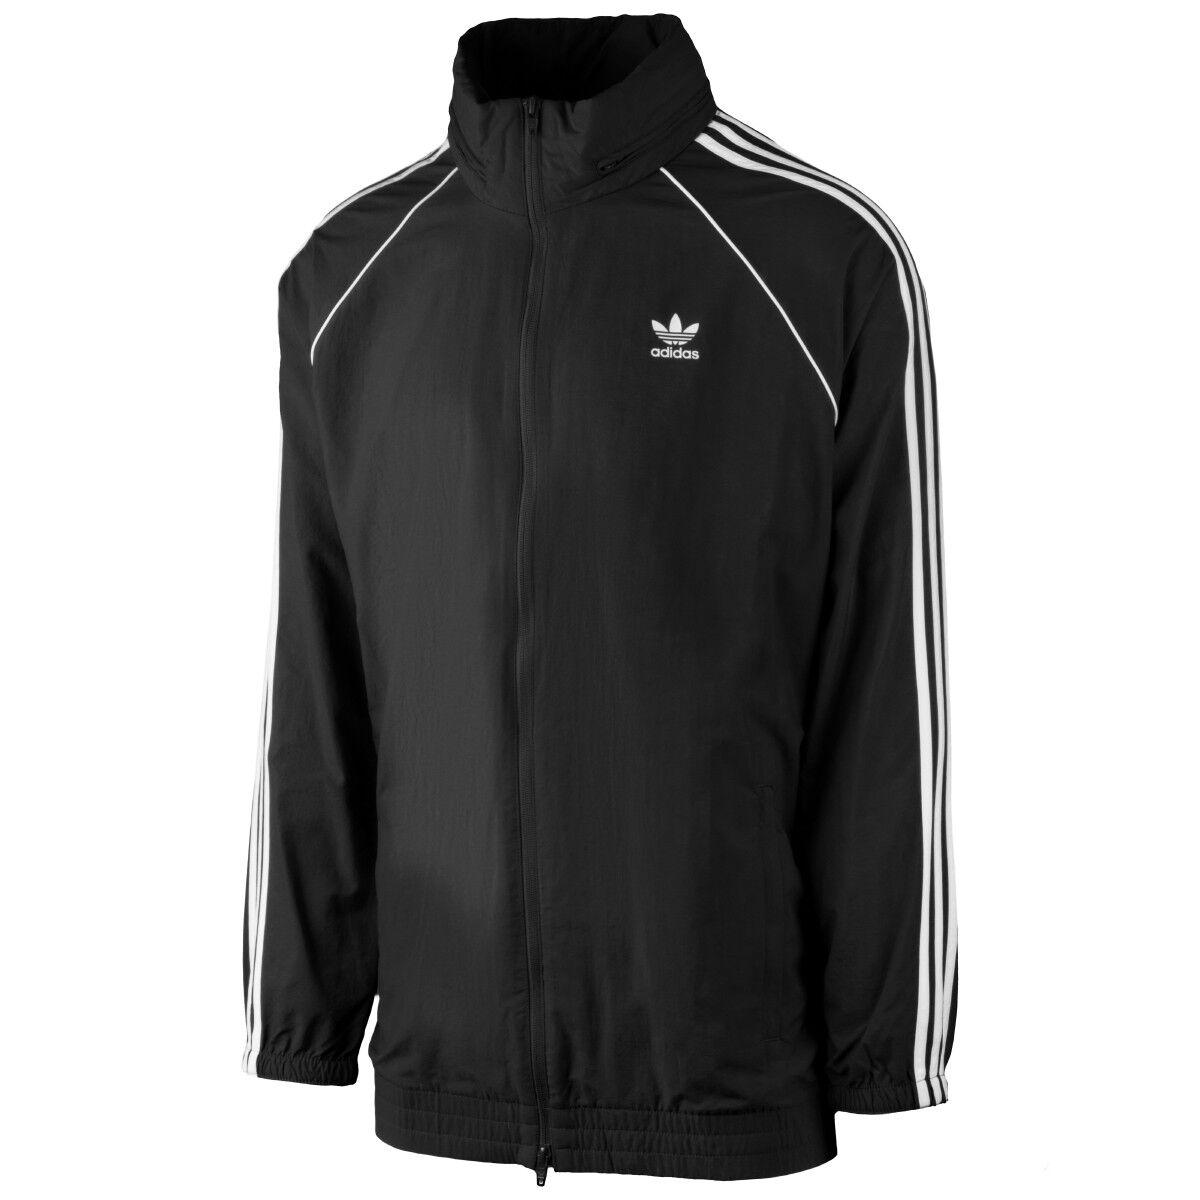 Adidas SST Windbreaker chaqueta señores retro cazadora lluvia chaqueta negro cw1309